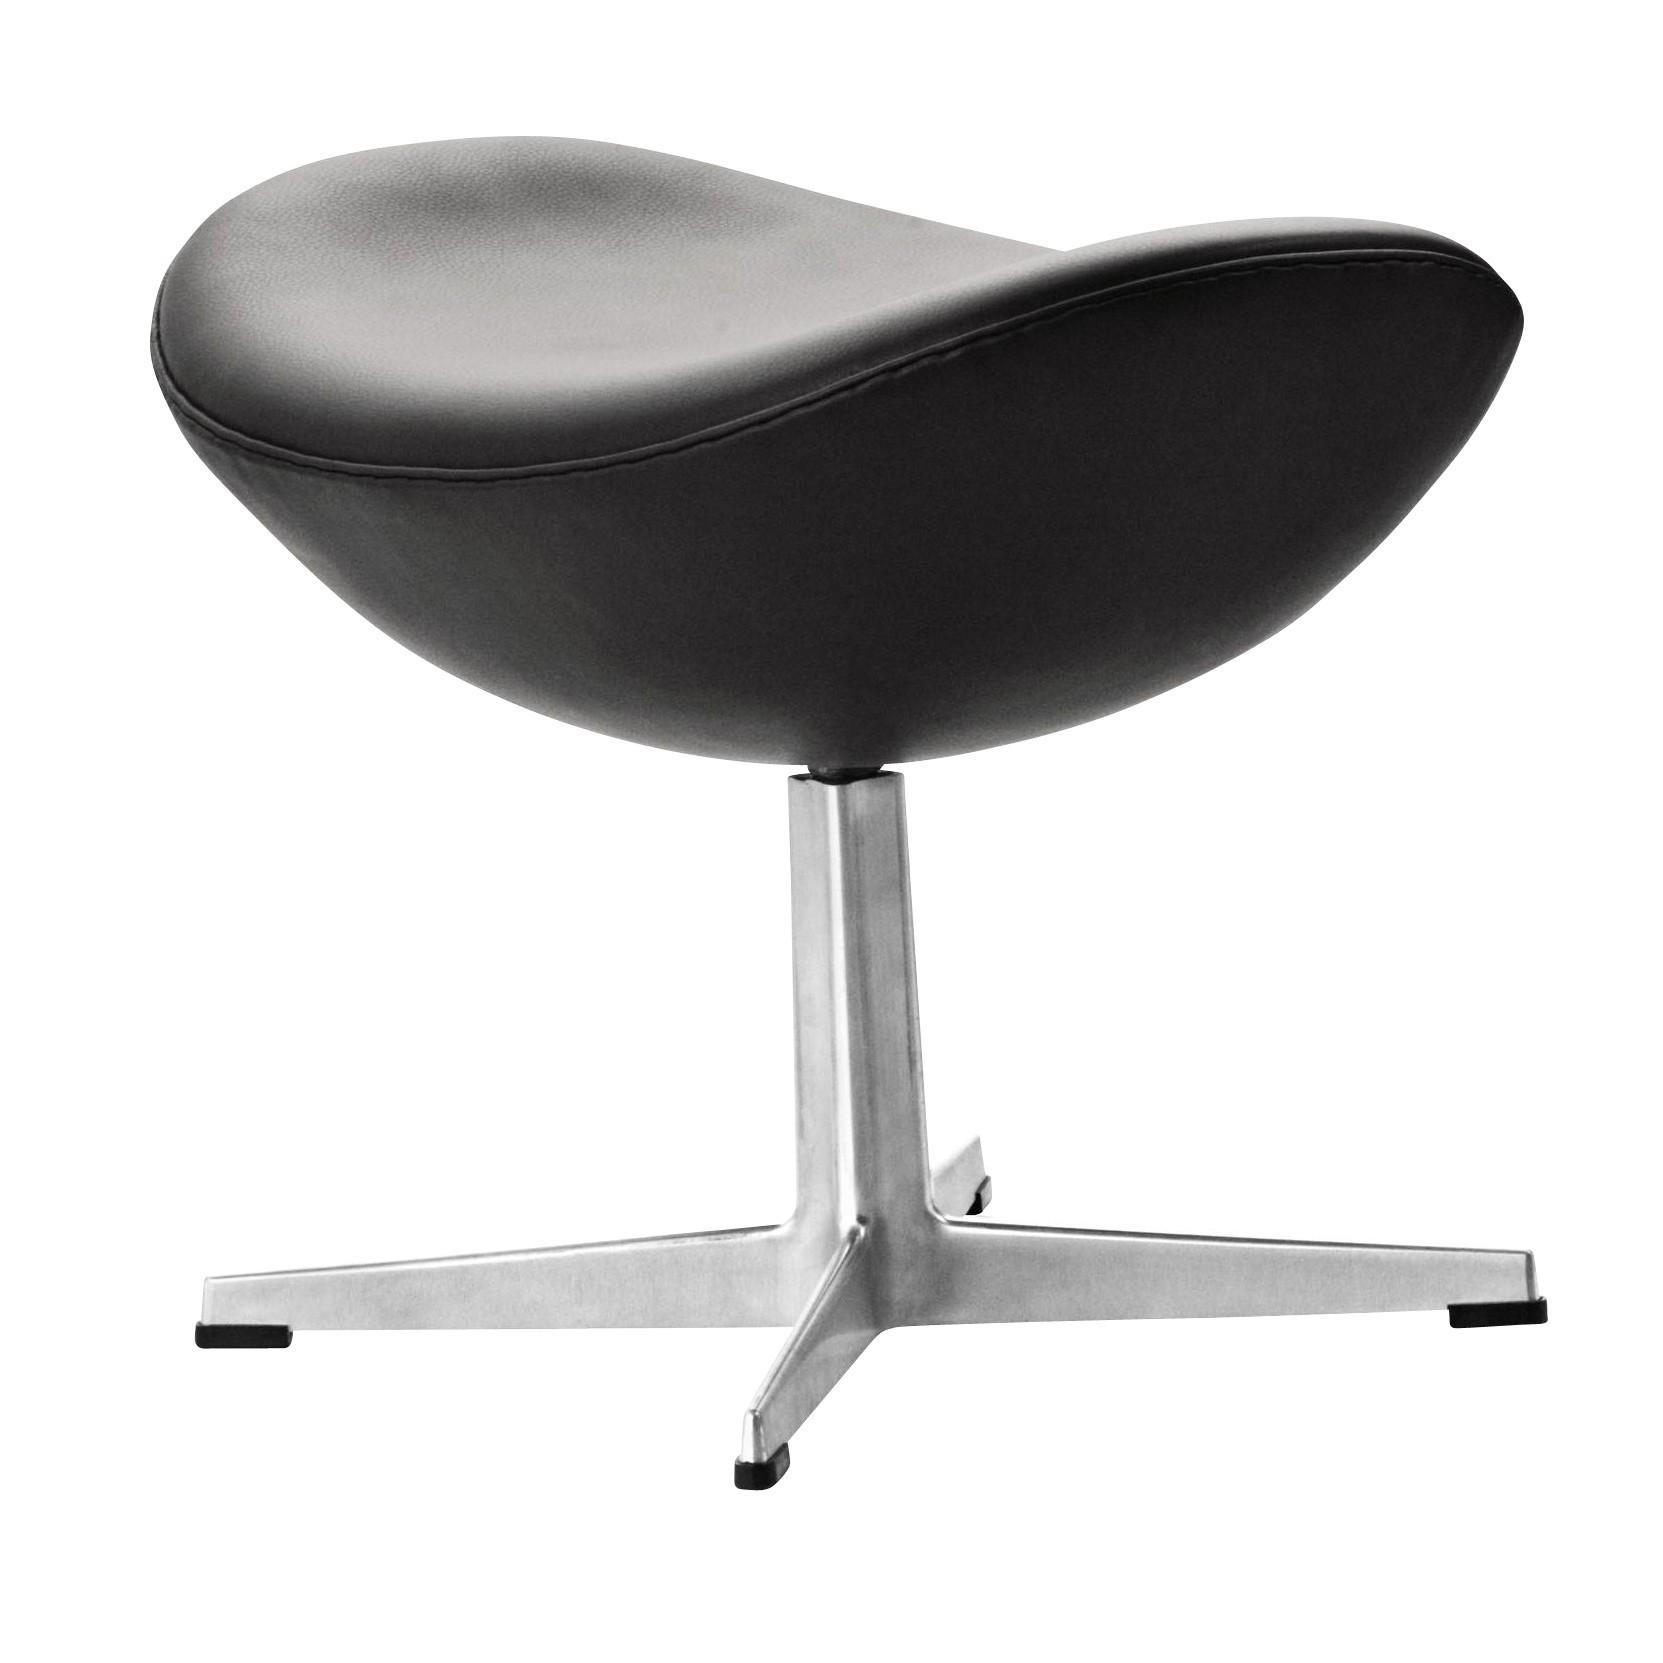 ... Fritz Hansen   Egg Chair Footstool Leather   Black/classic  Leather/frame Aluminium ...